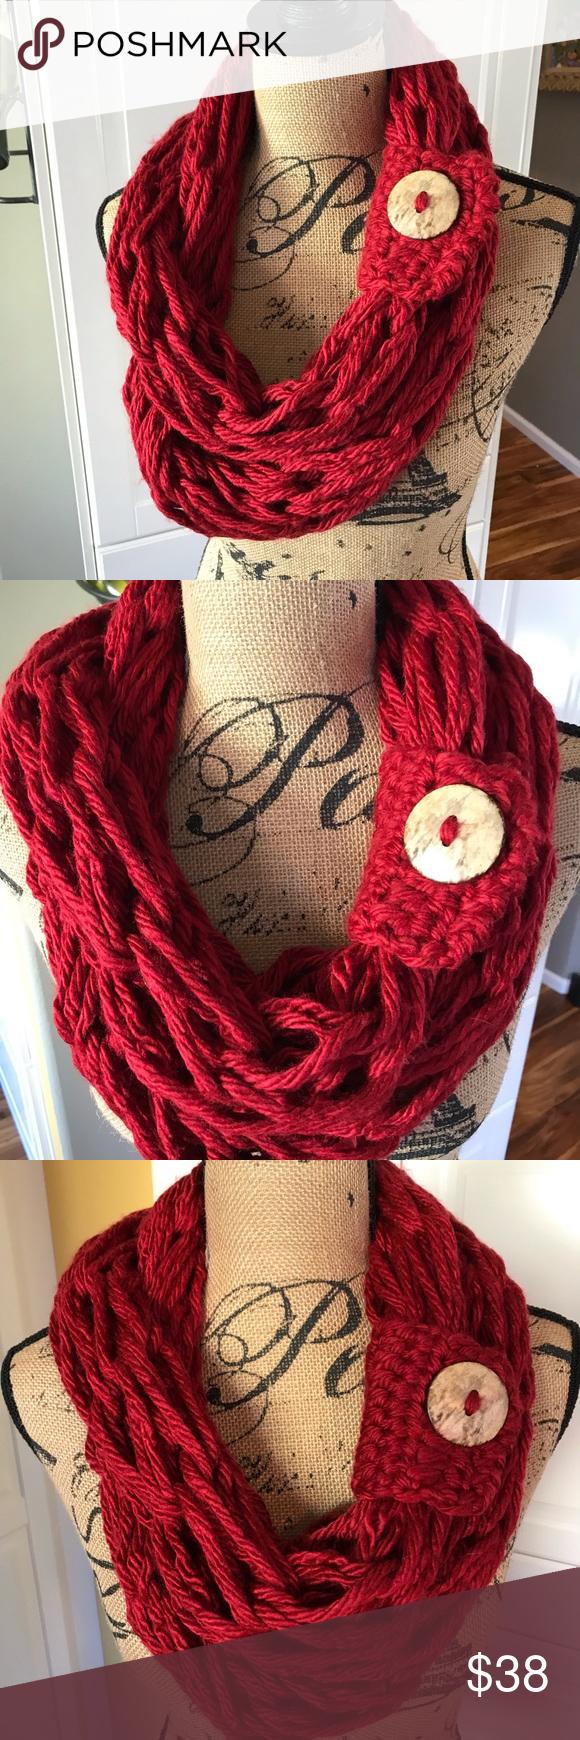 Photo of Langer roter, sperriger, sperriger Schal mit Kokosnussknopf MUNANDME Roter, langer, gestrickter Schal …